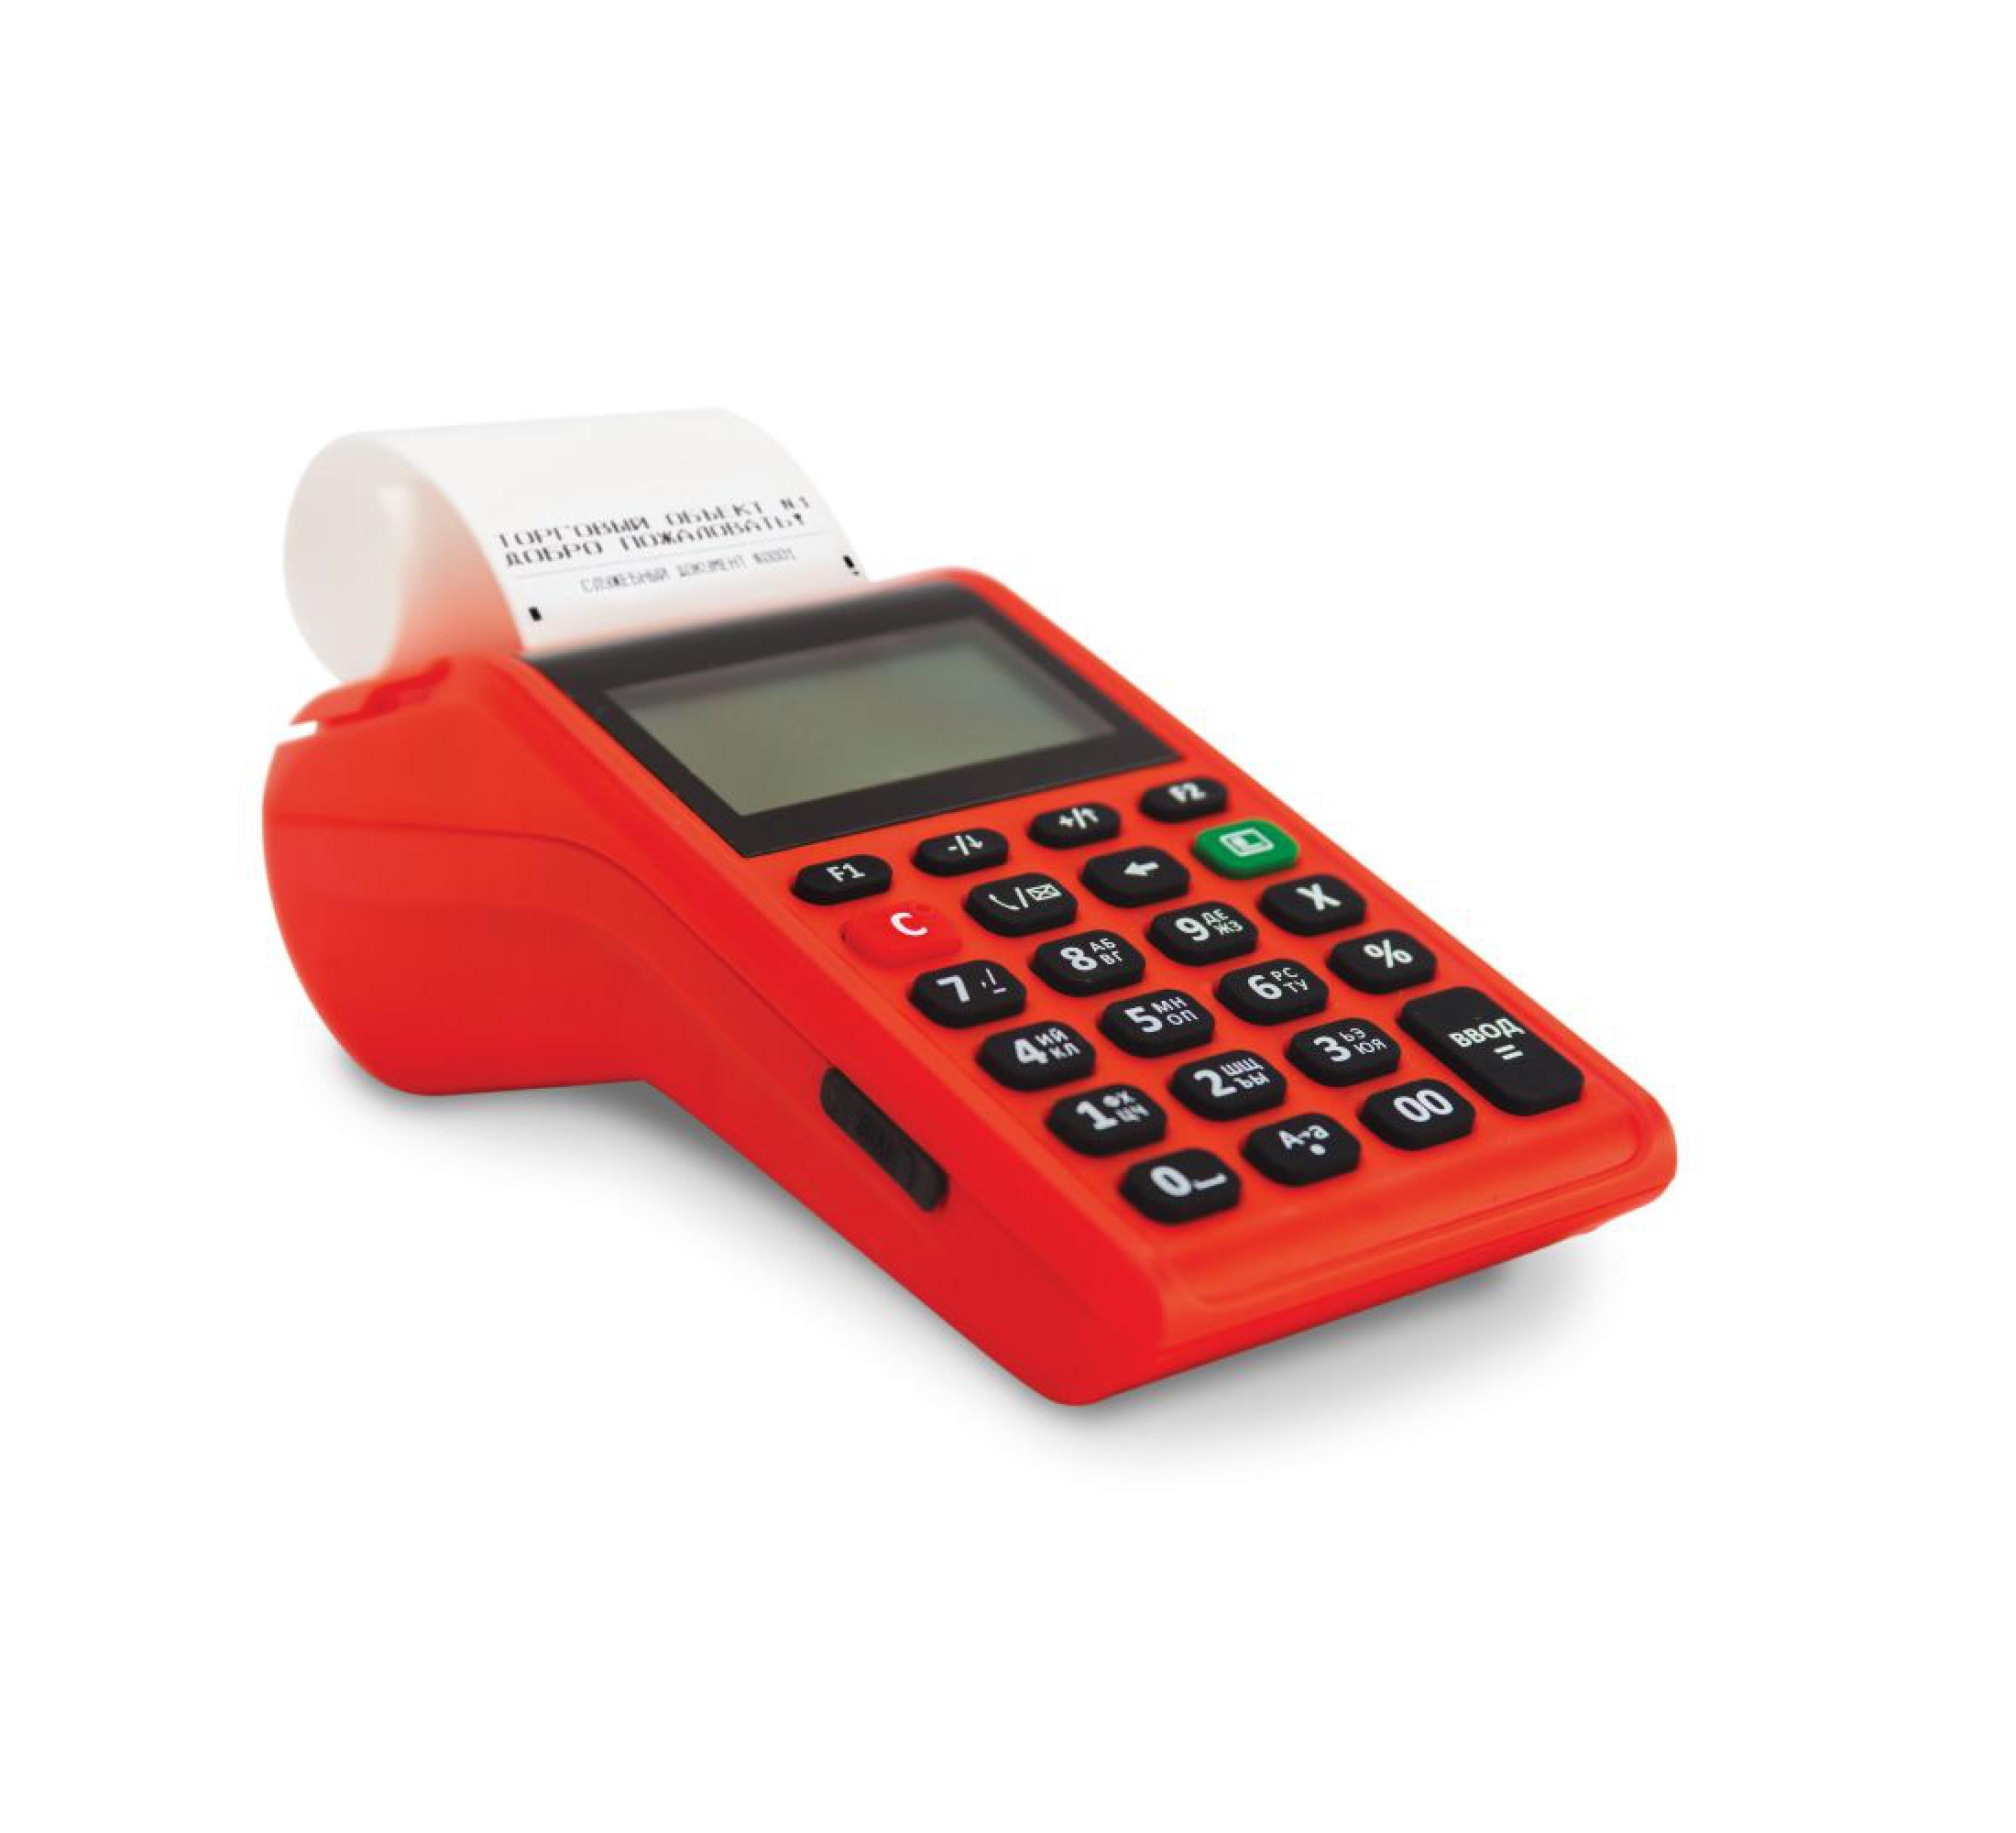 Онлайн-касса АТОЛ 91Ф (ФН36, Wi-Fi, BT, 2G, Ethernet, красная)  АКЦИЯ!!! Сканер ШК или Детектор валют в подарок!